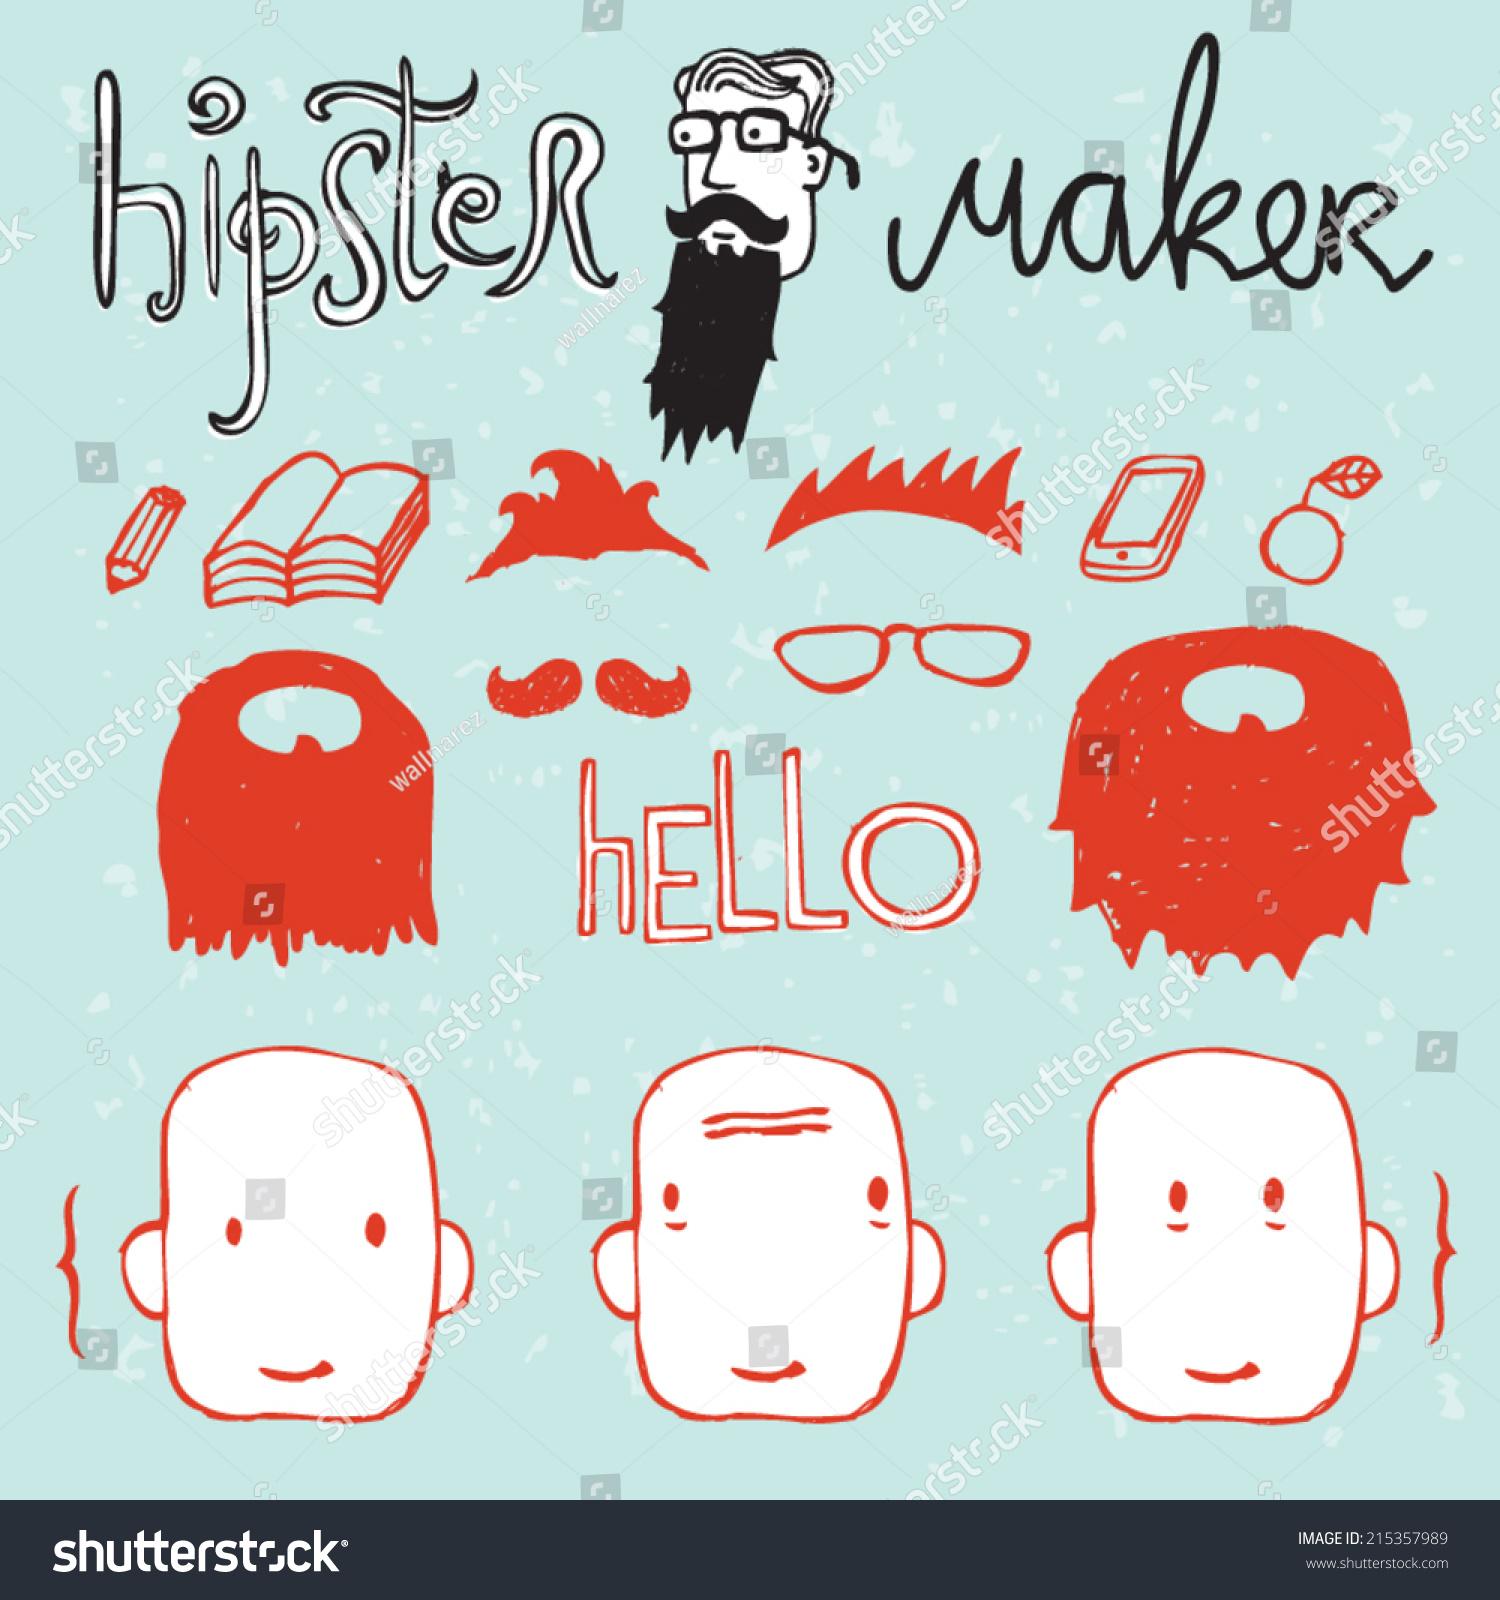 Hipster Maker Avatar Creator Stock Vector Illustration